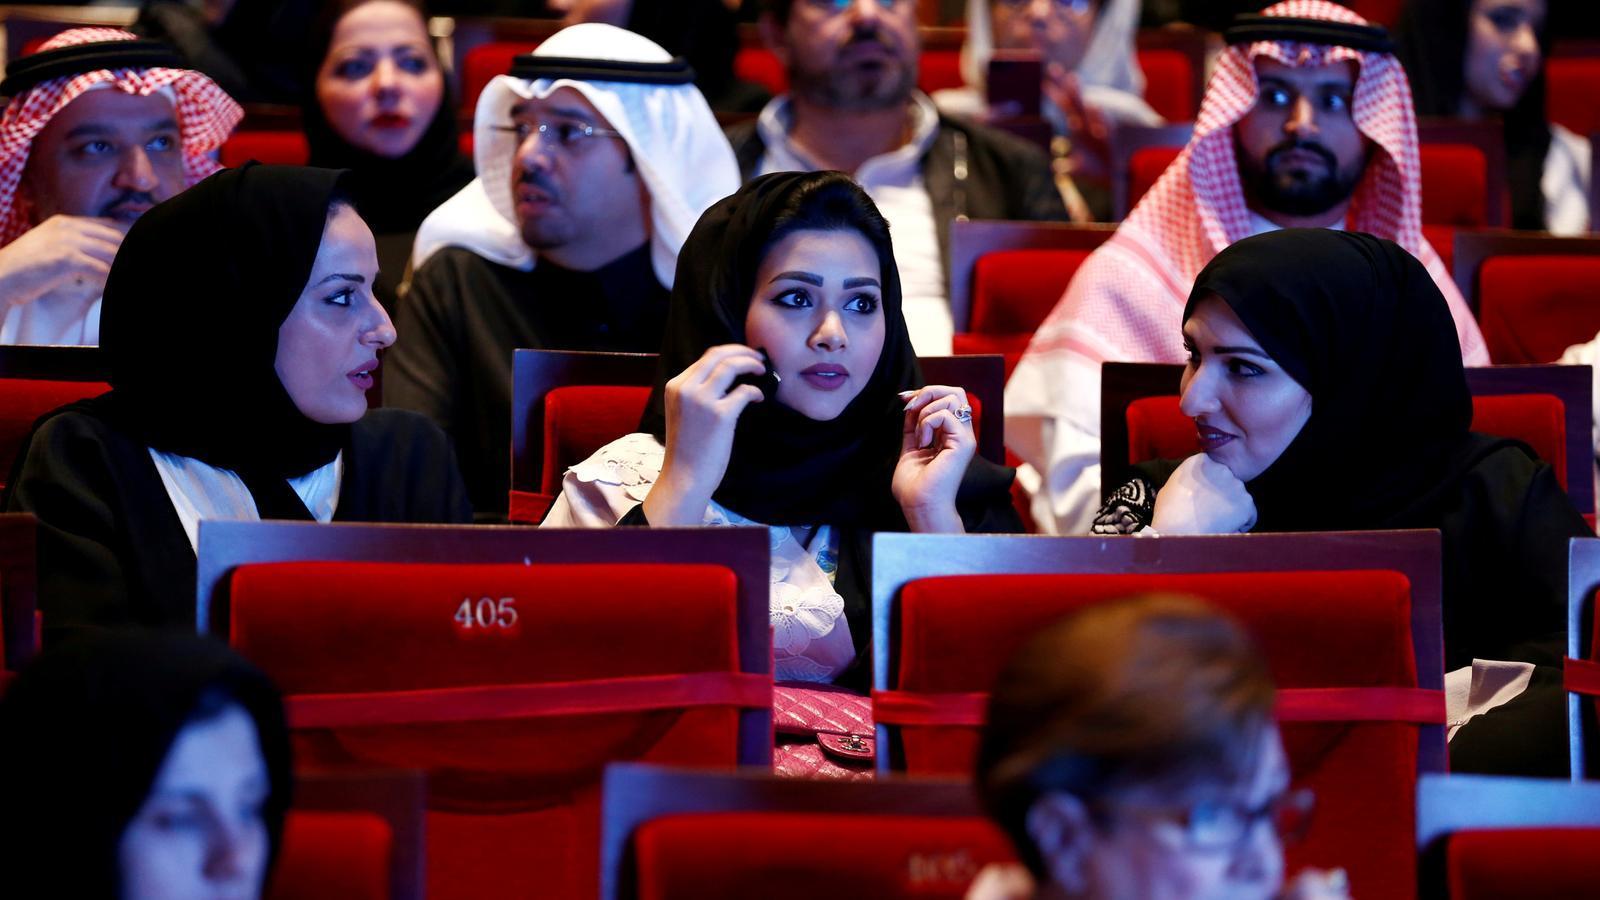 Ciutadans observen al compositor Yanni en la universitat Princesa Nourah bint Abdulrahman a Riad